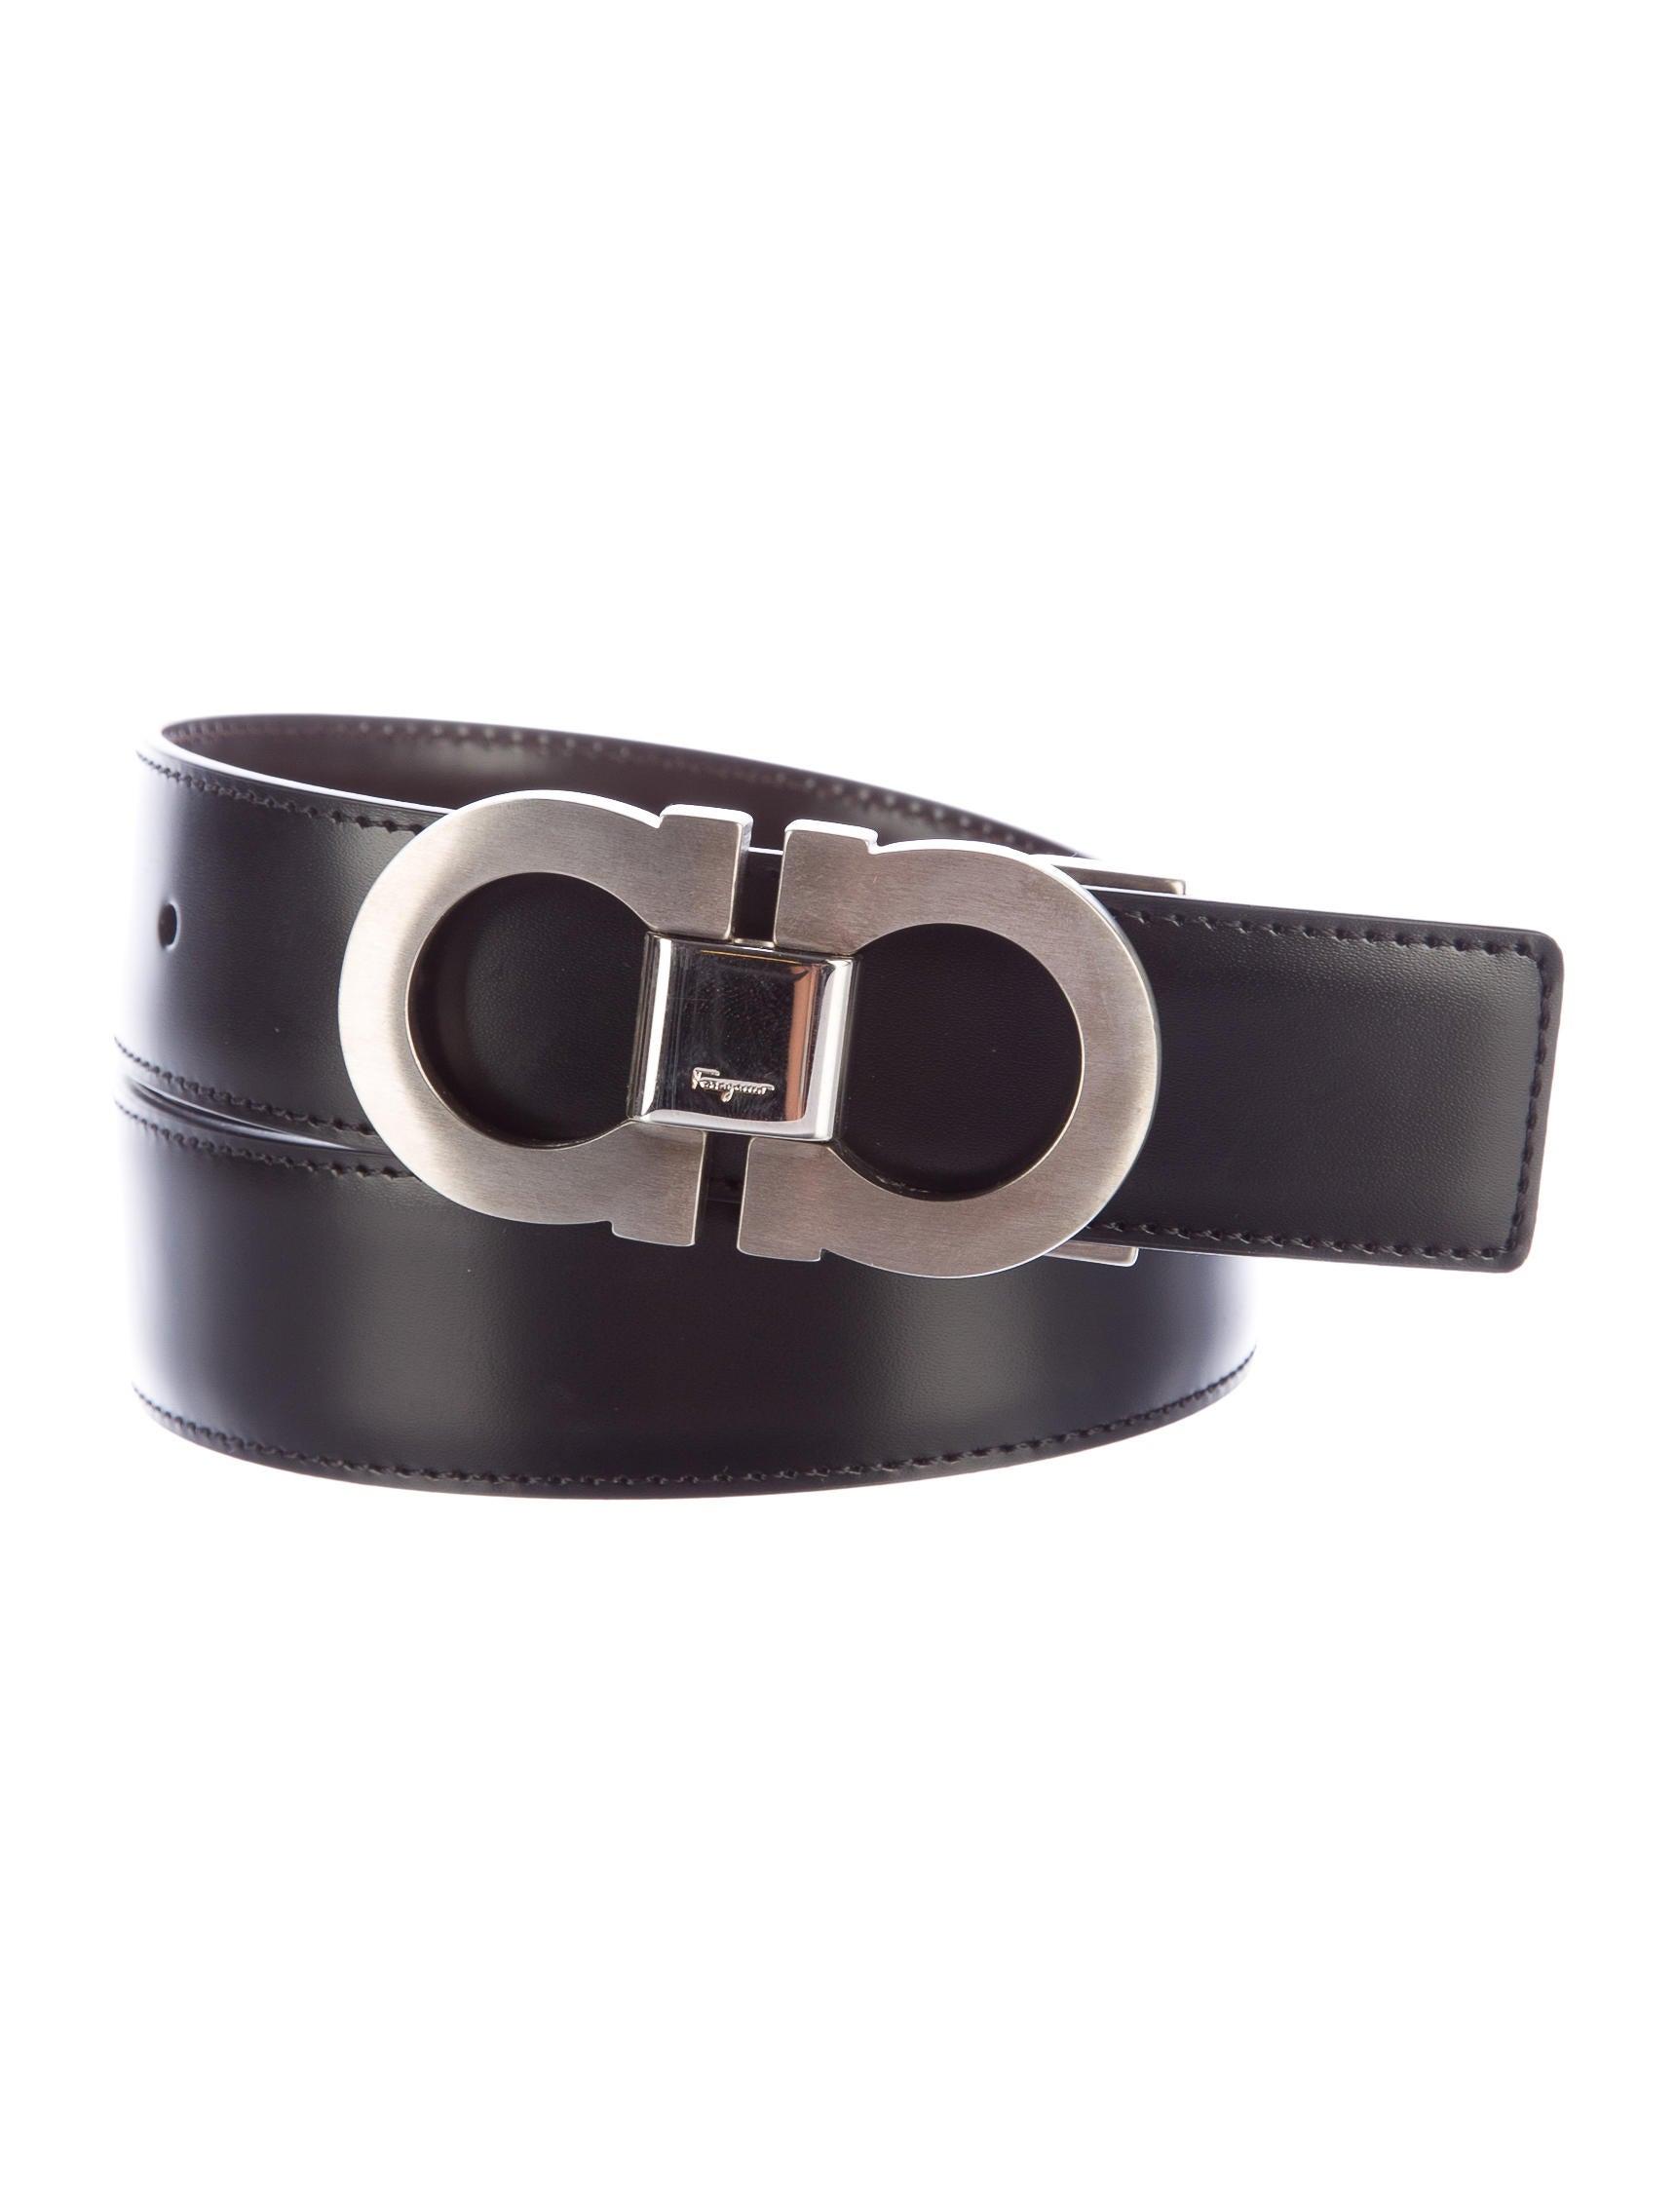 salvatore ferragamo gancio reversible leather belt w tags